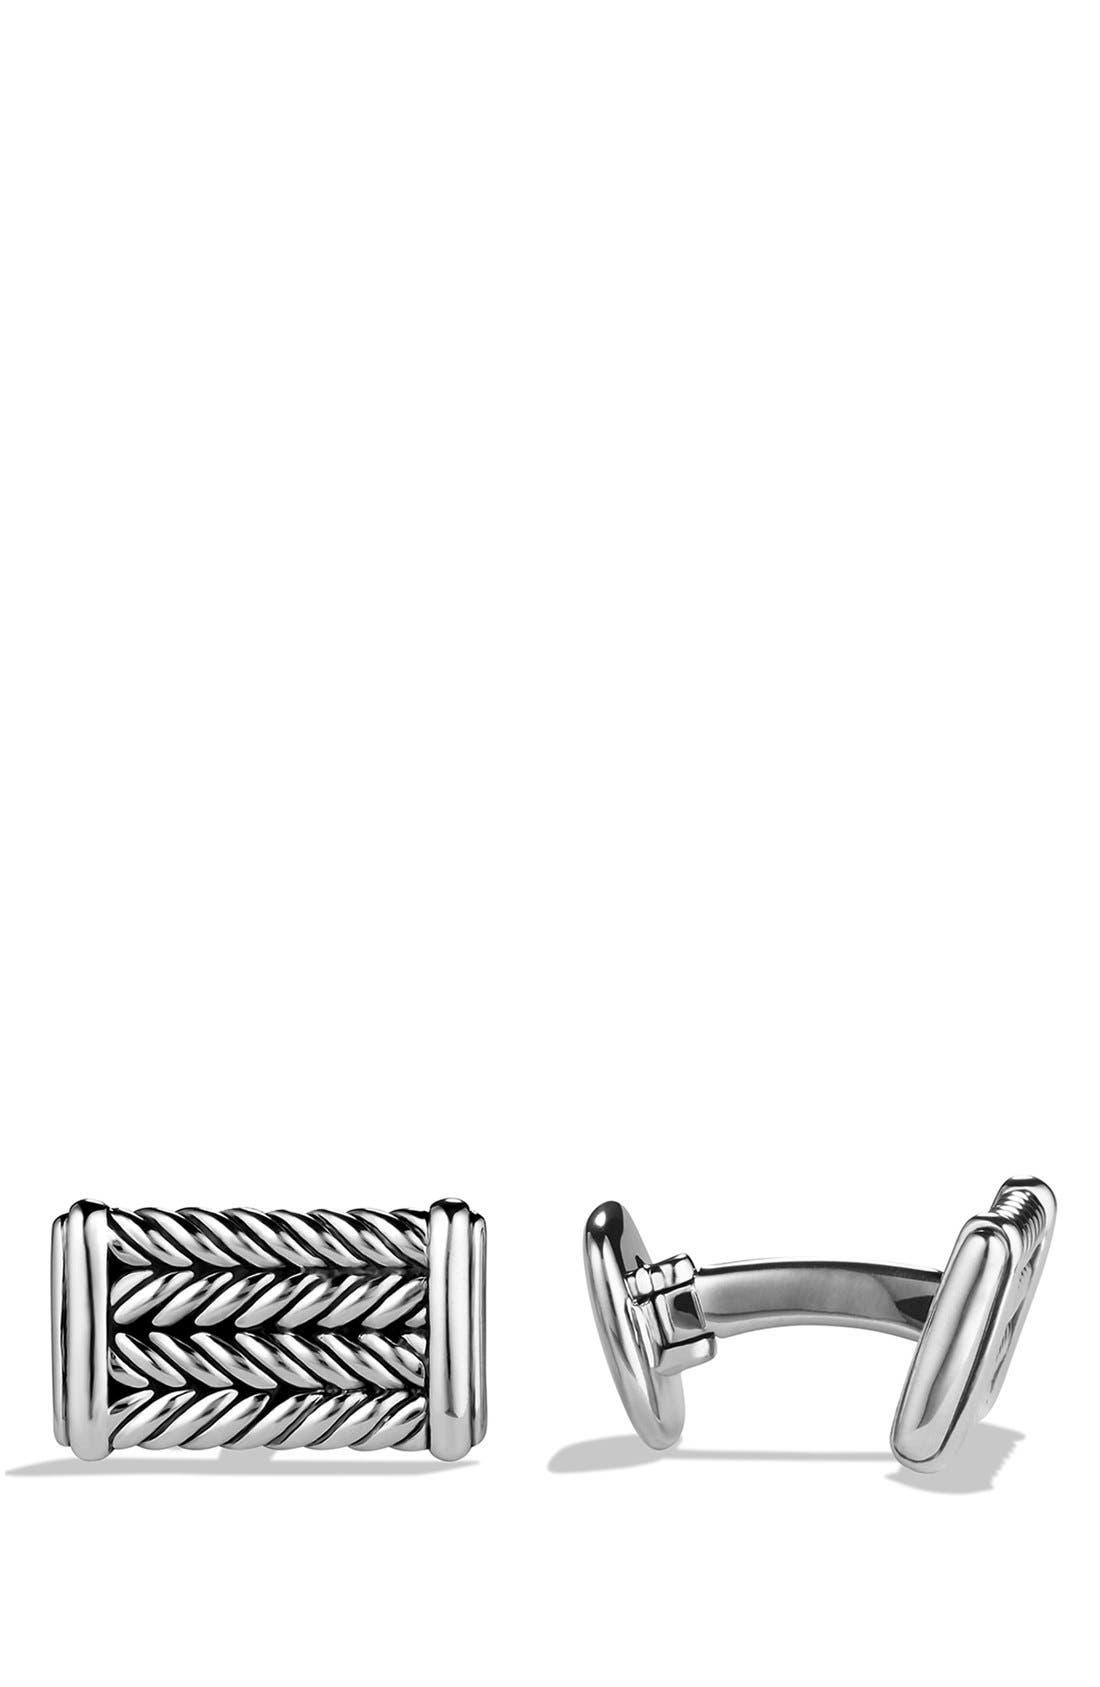 'Chevron' Cuff Links,                             Main thumbnail 1, color,                             Silver